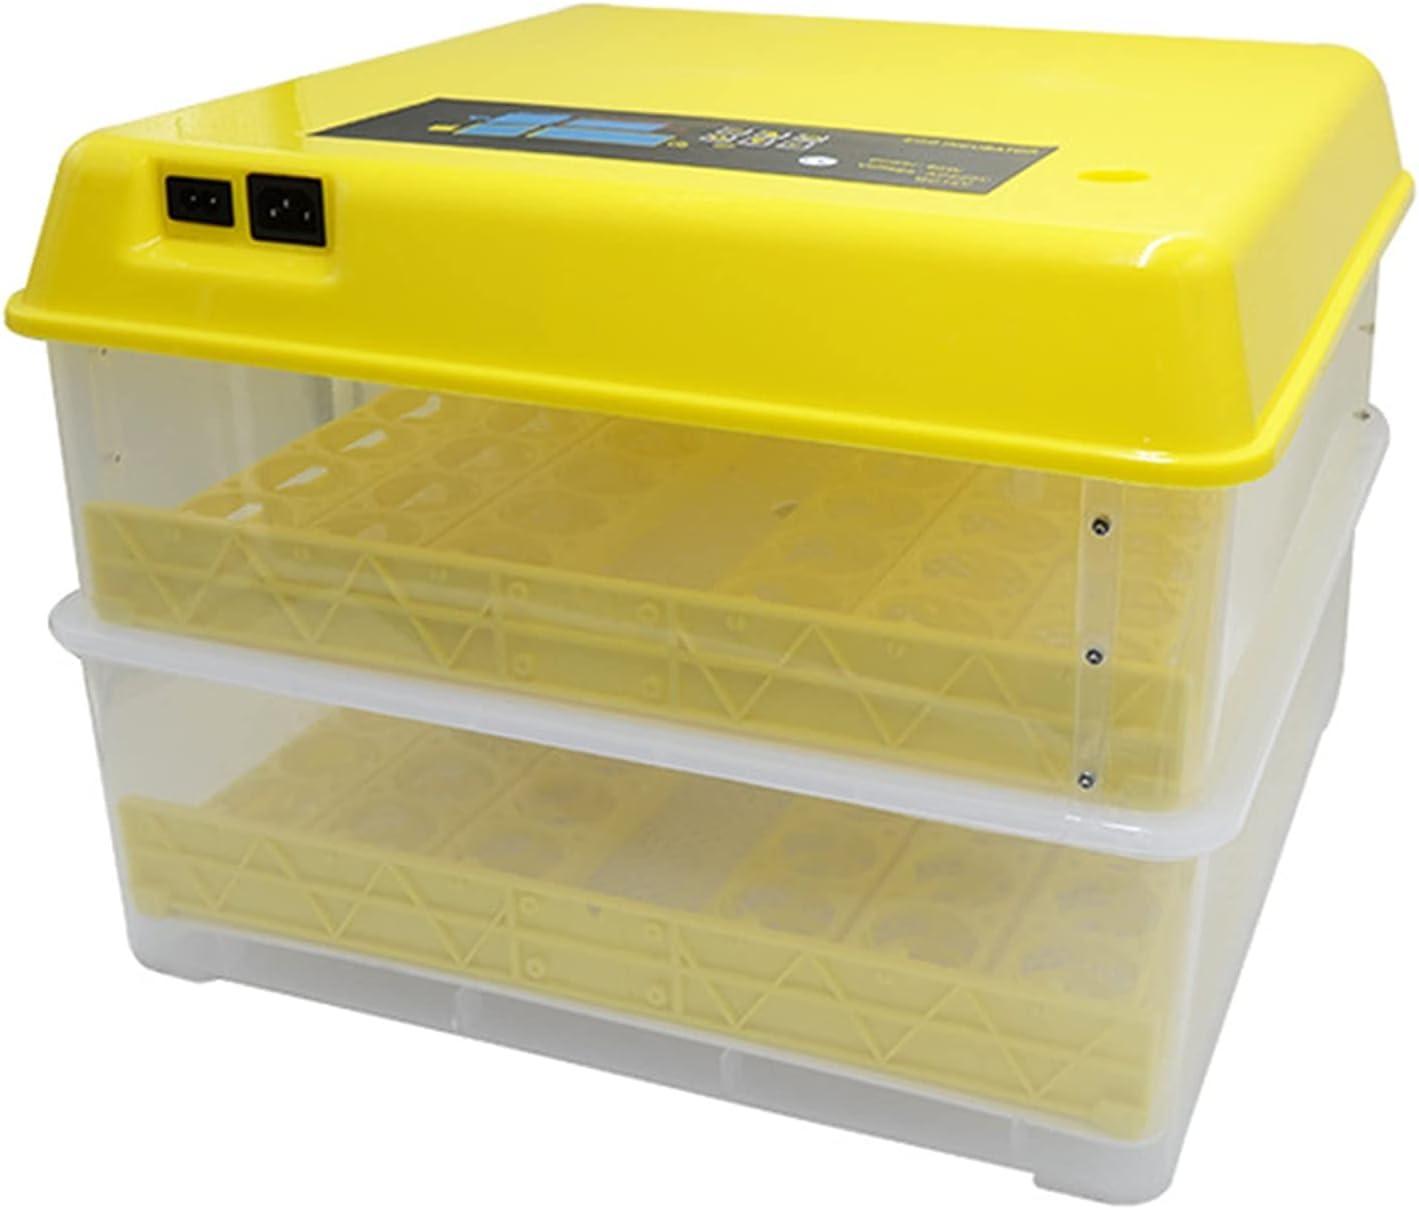 YAWEDA Incubator 96 Eggs Hatching Automatic Hatc Digital Free shipping anywhere in the nation Machine Classic